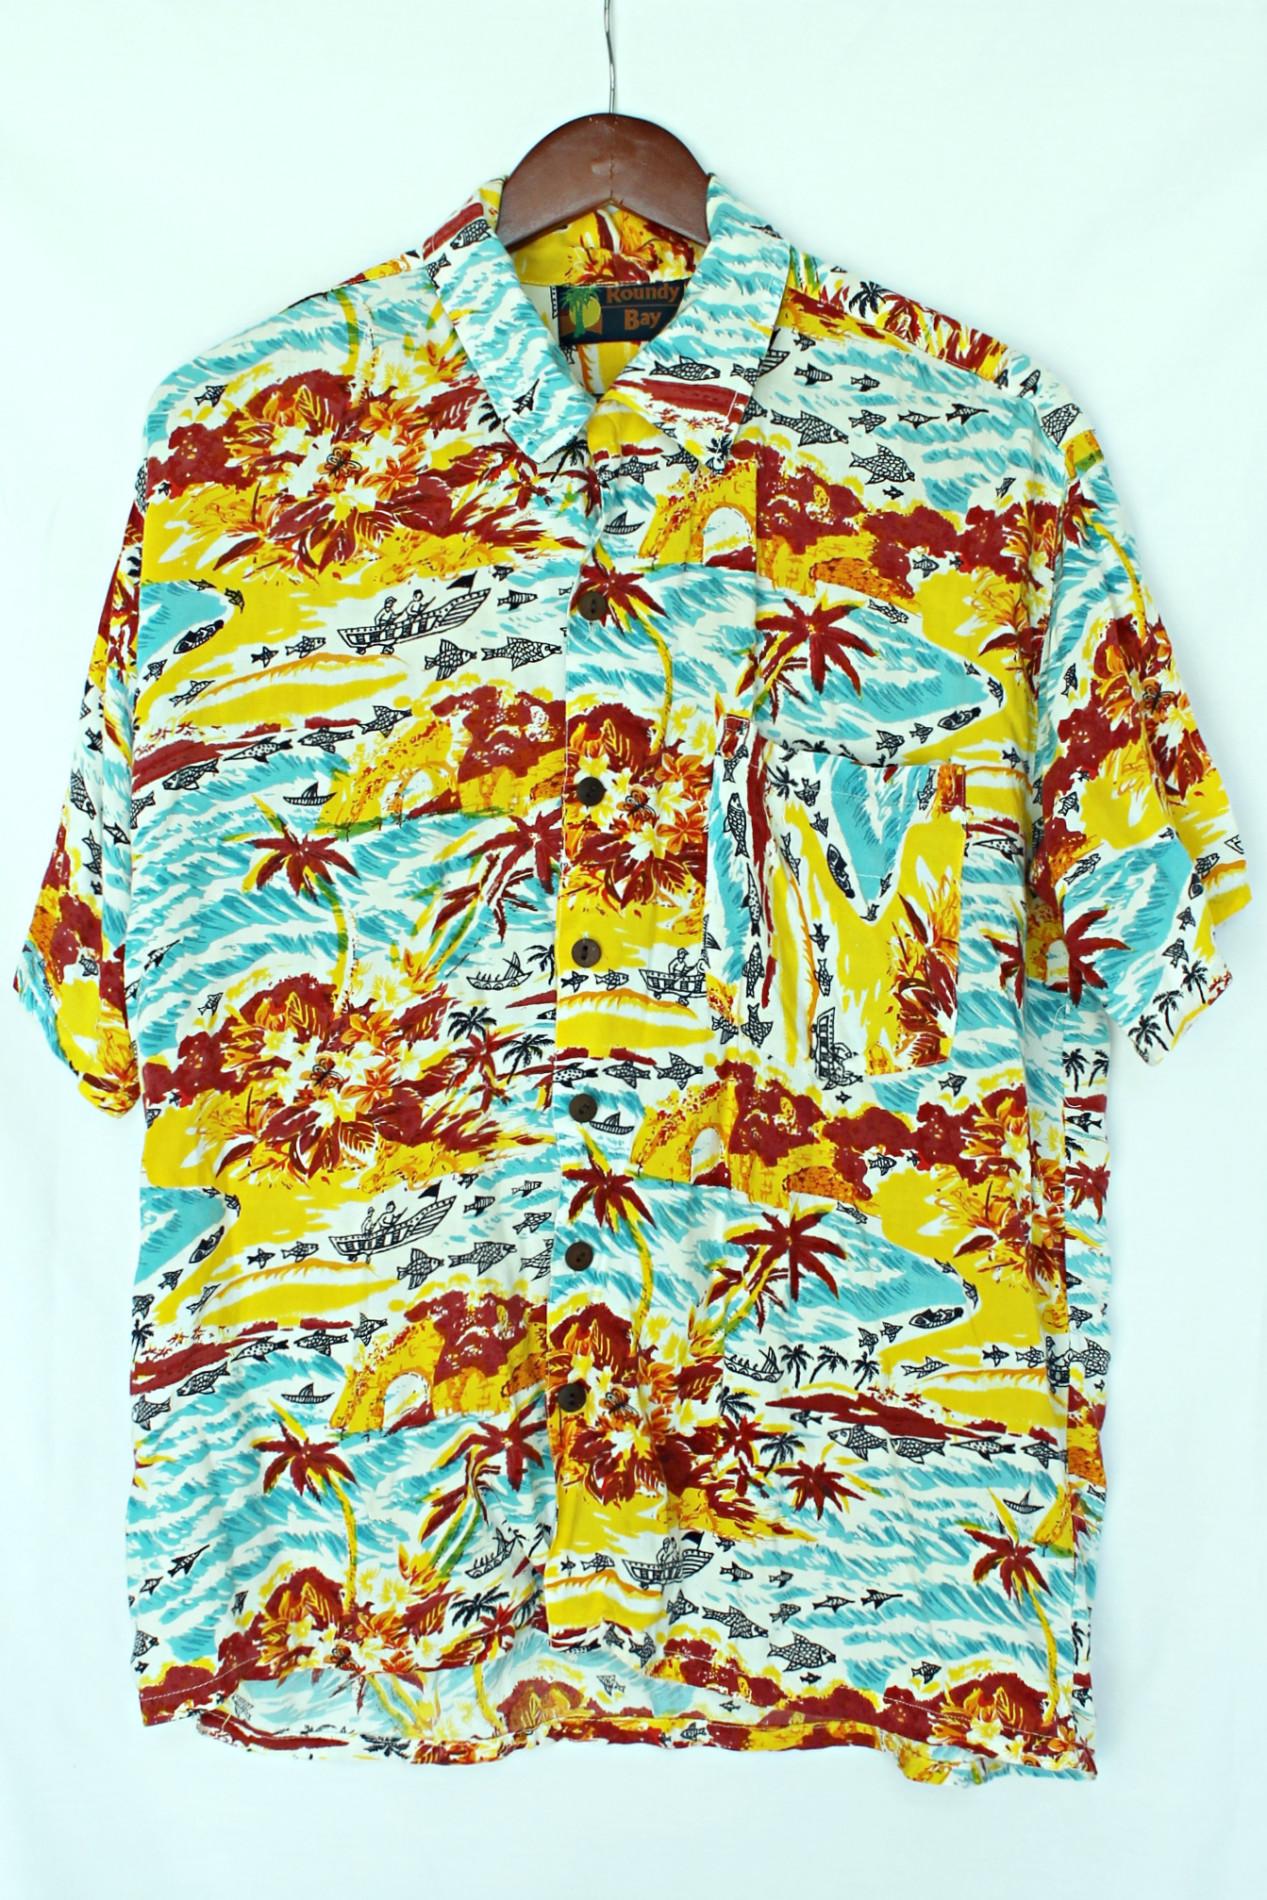 Down By The Bay Button-Down Shirt | Just Vu